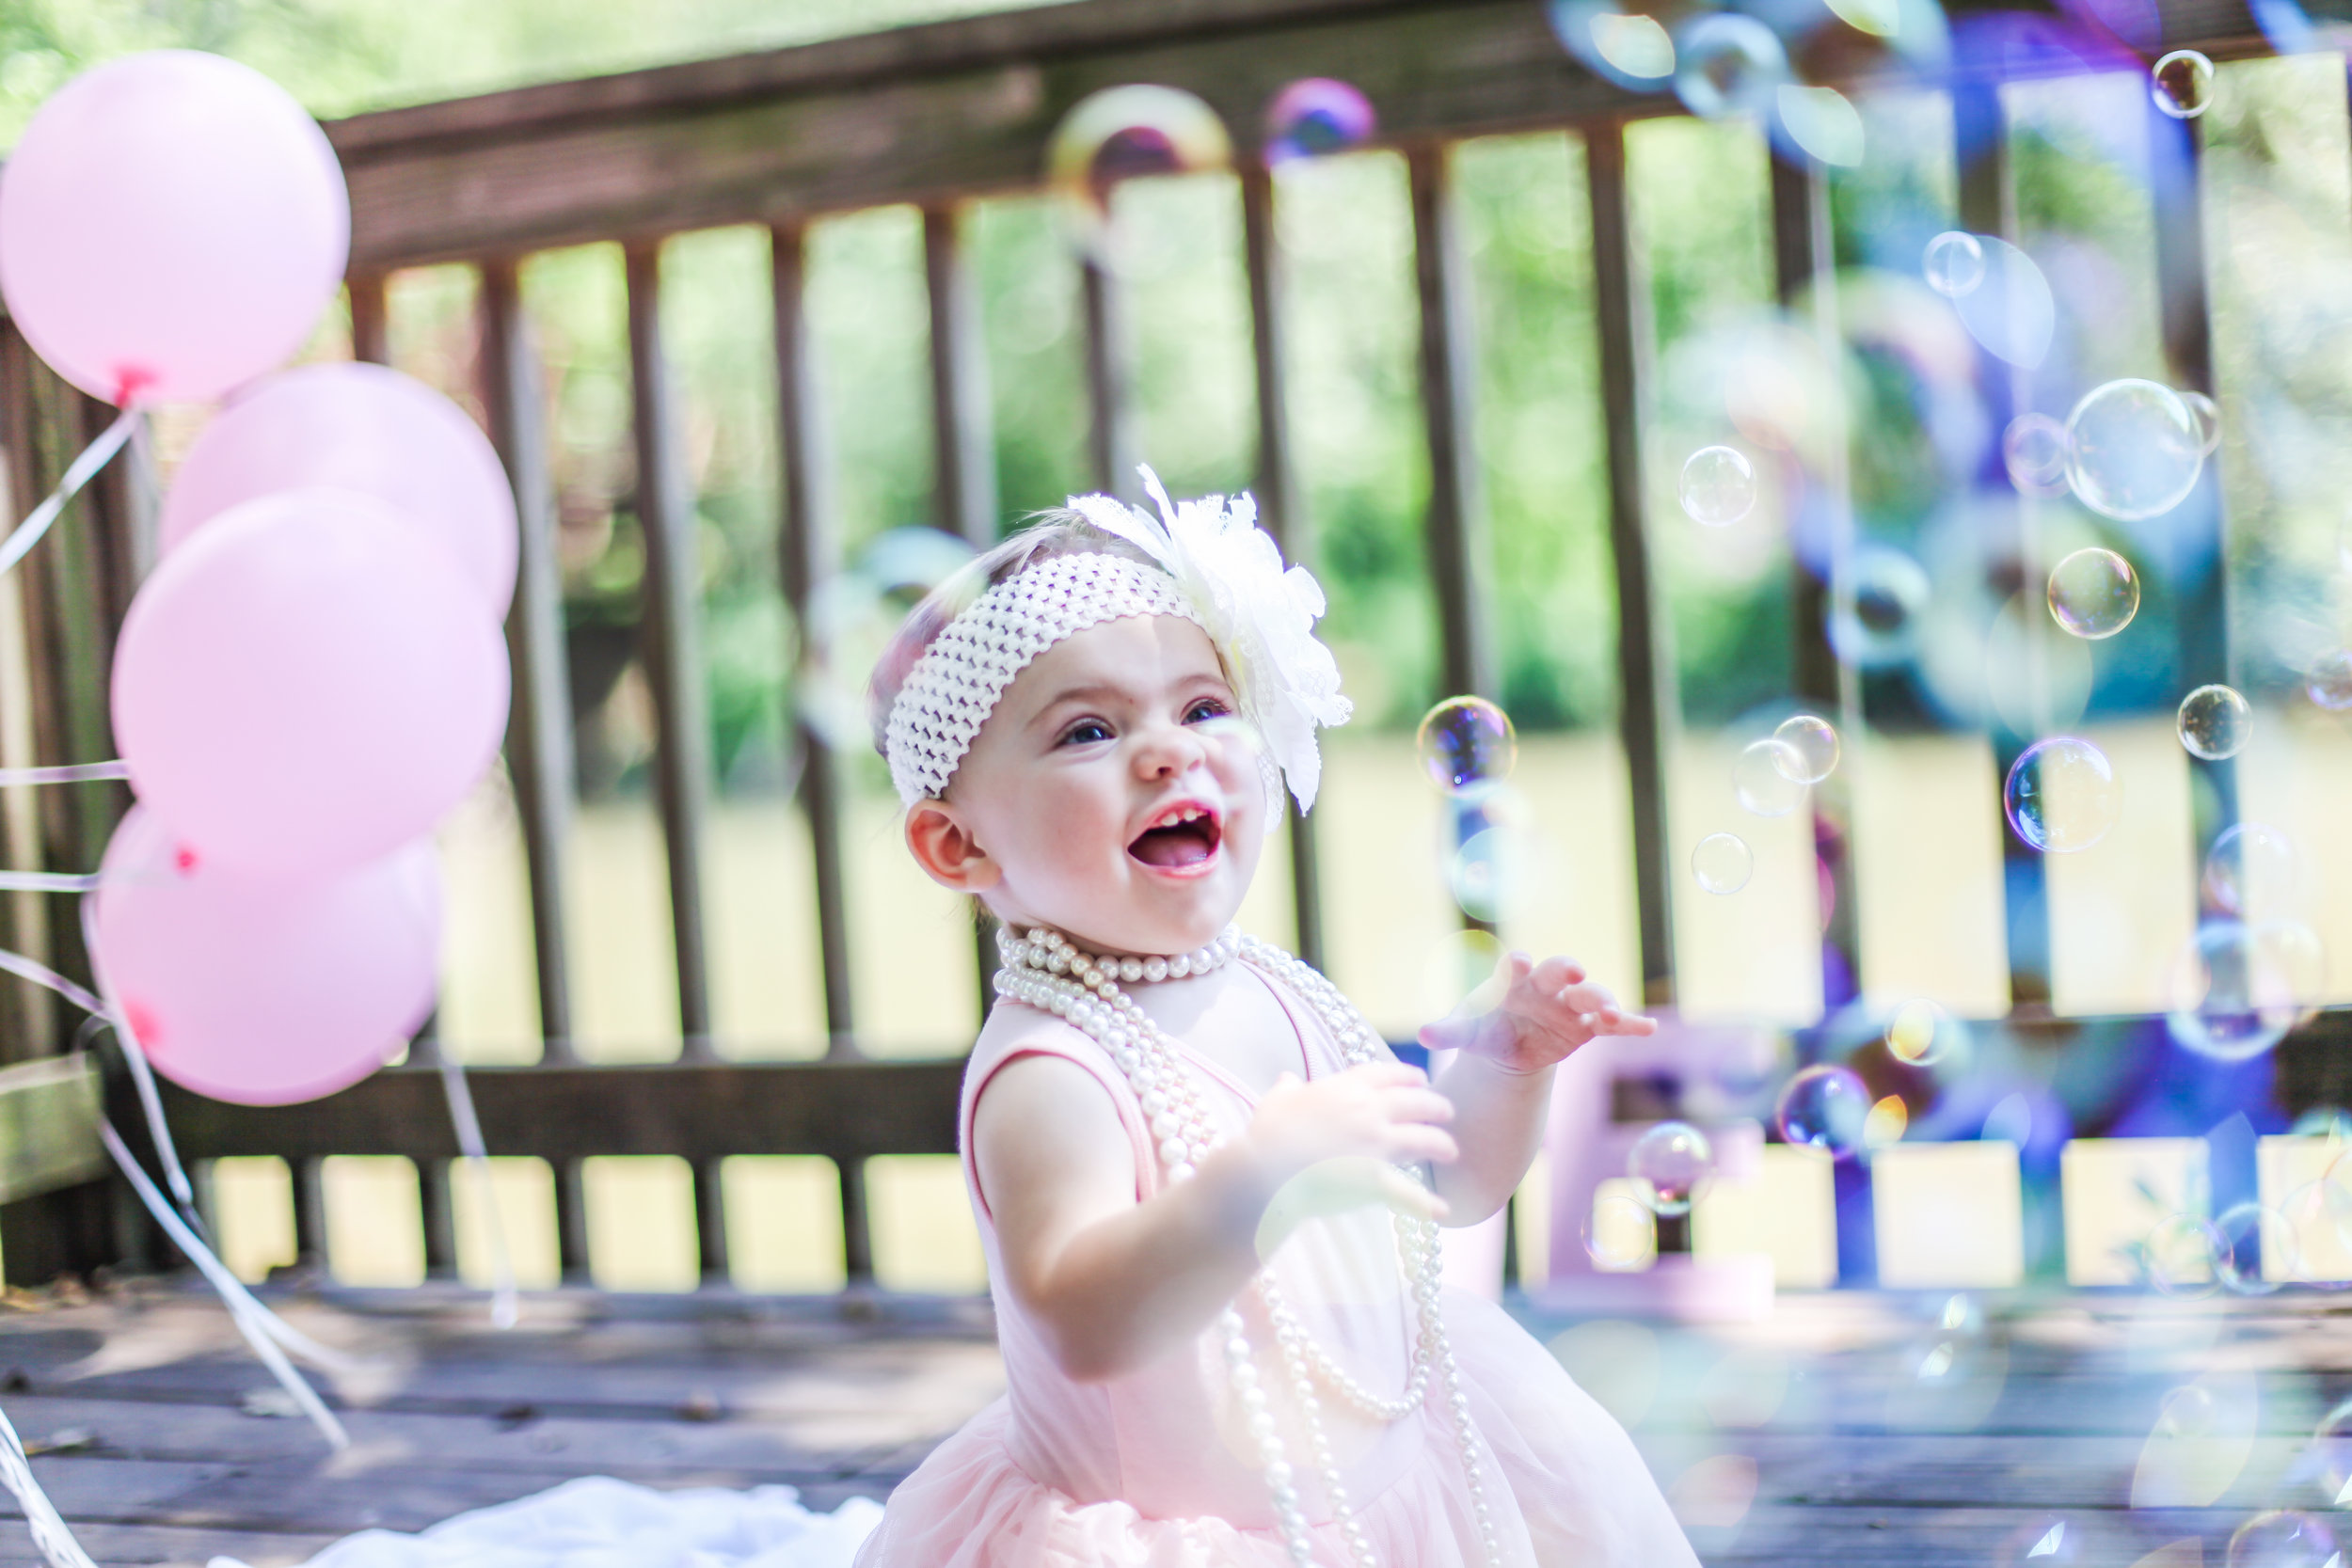 woodstock baby photography angela elliott-58.jpg